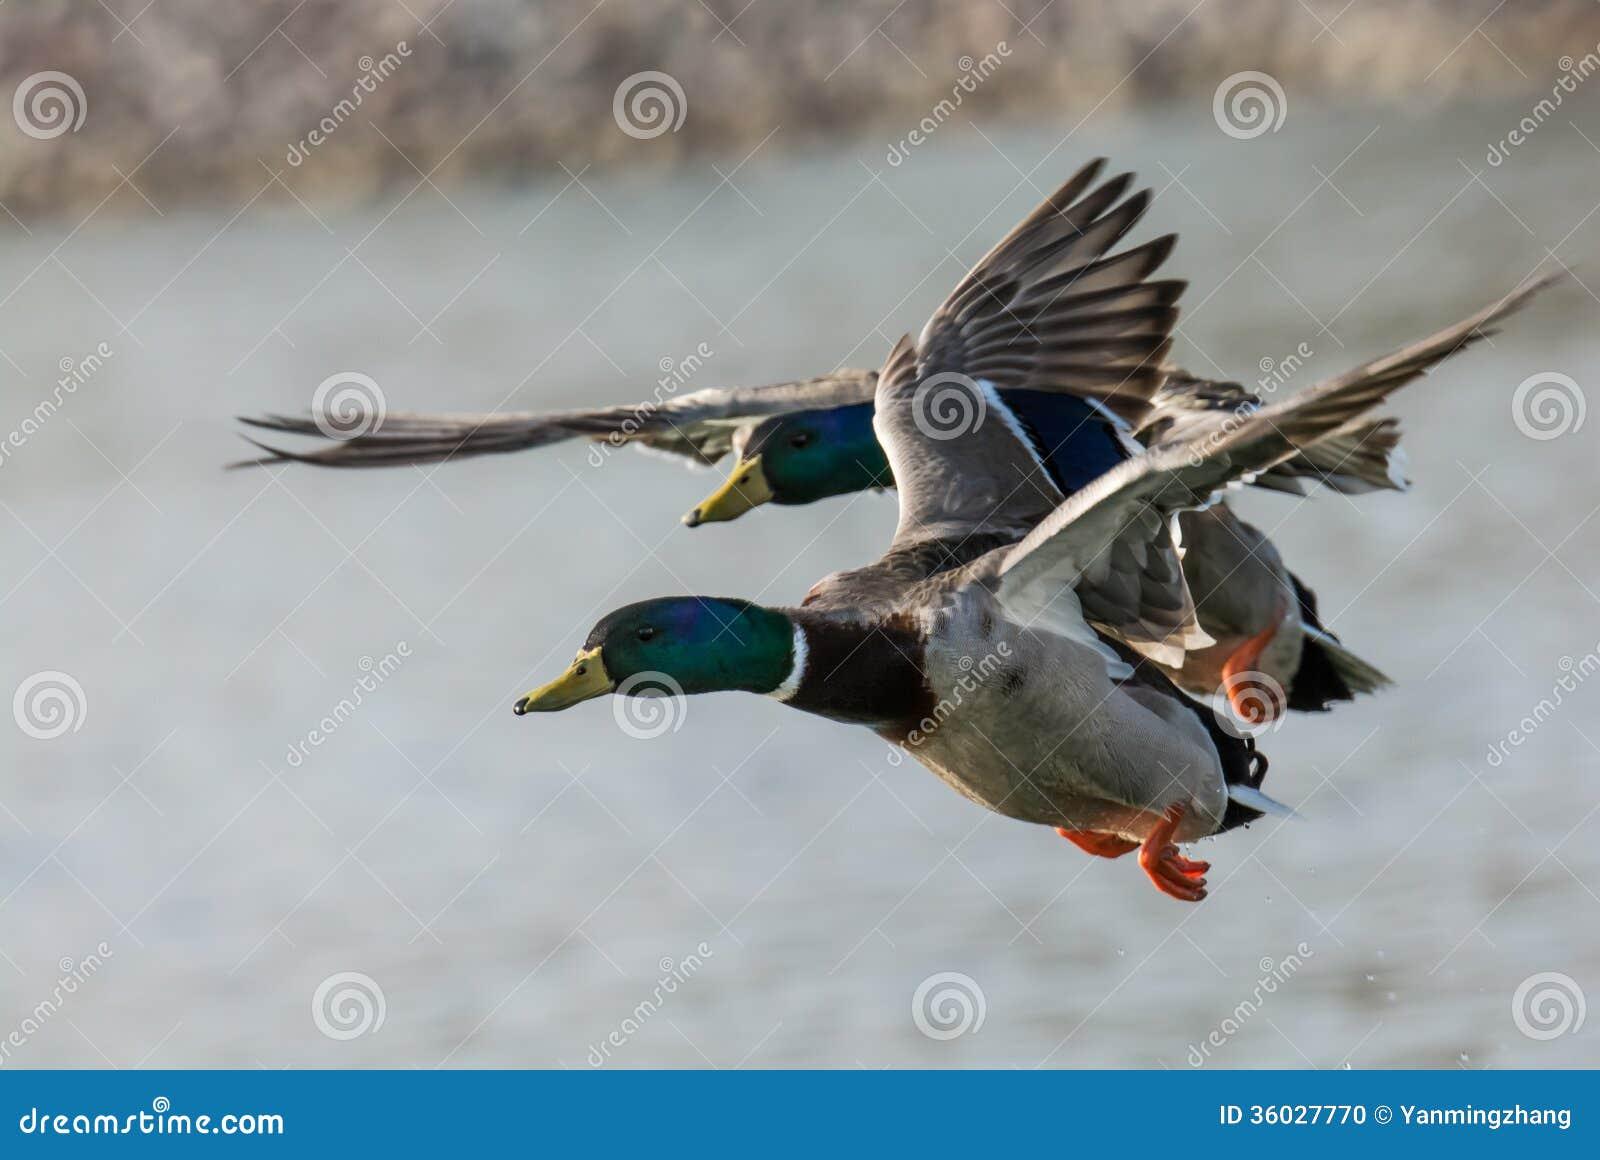 Ducks Flying Over A La...